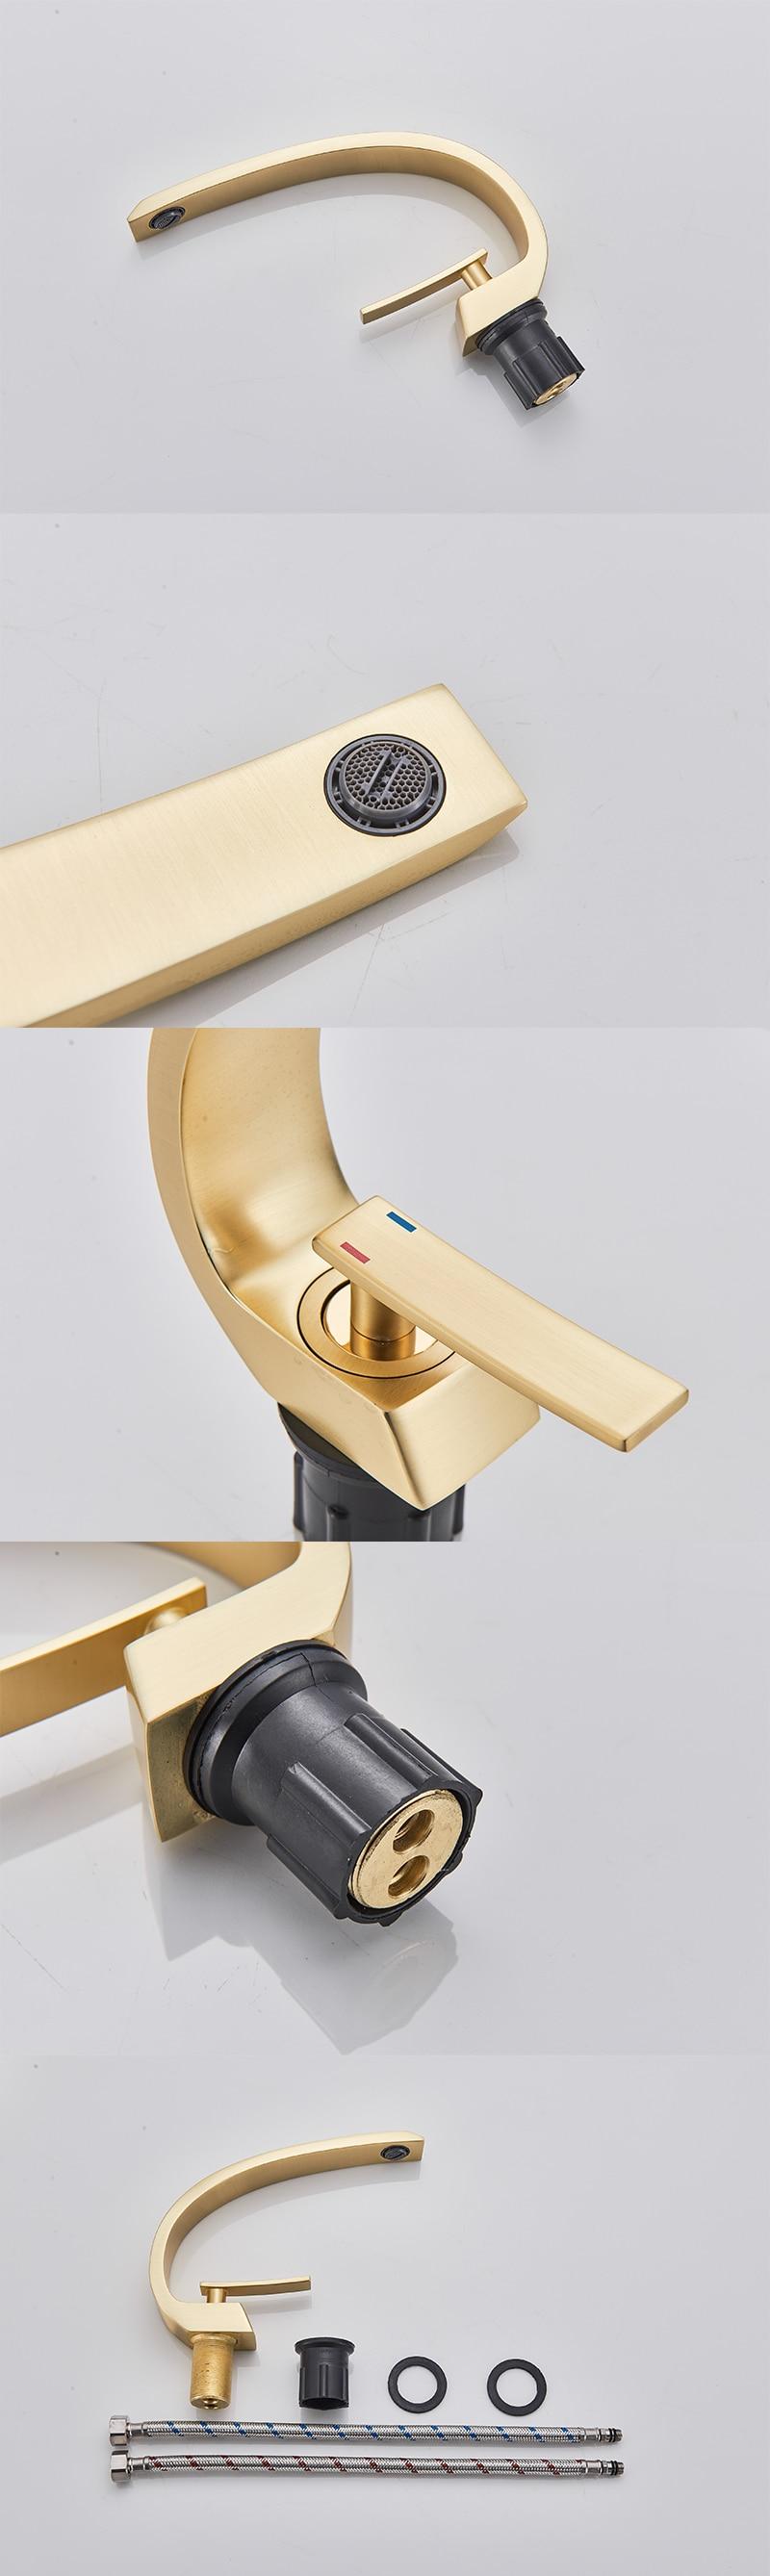 Hca2cb1bd535e4728b1170bab689e9cc1X Senlesen Bathroom Faucet Ceramic Valve Cold and Hot Water Mixer Tap Single Handle Vanity Sink Basin Faucets